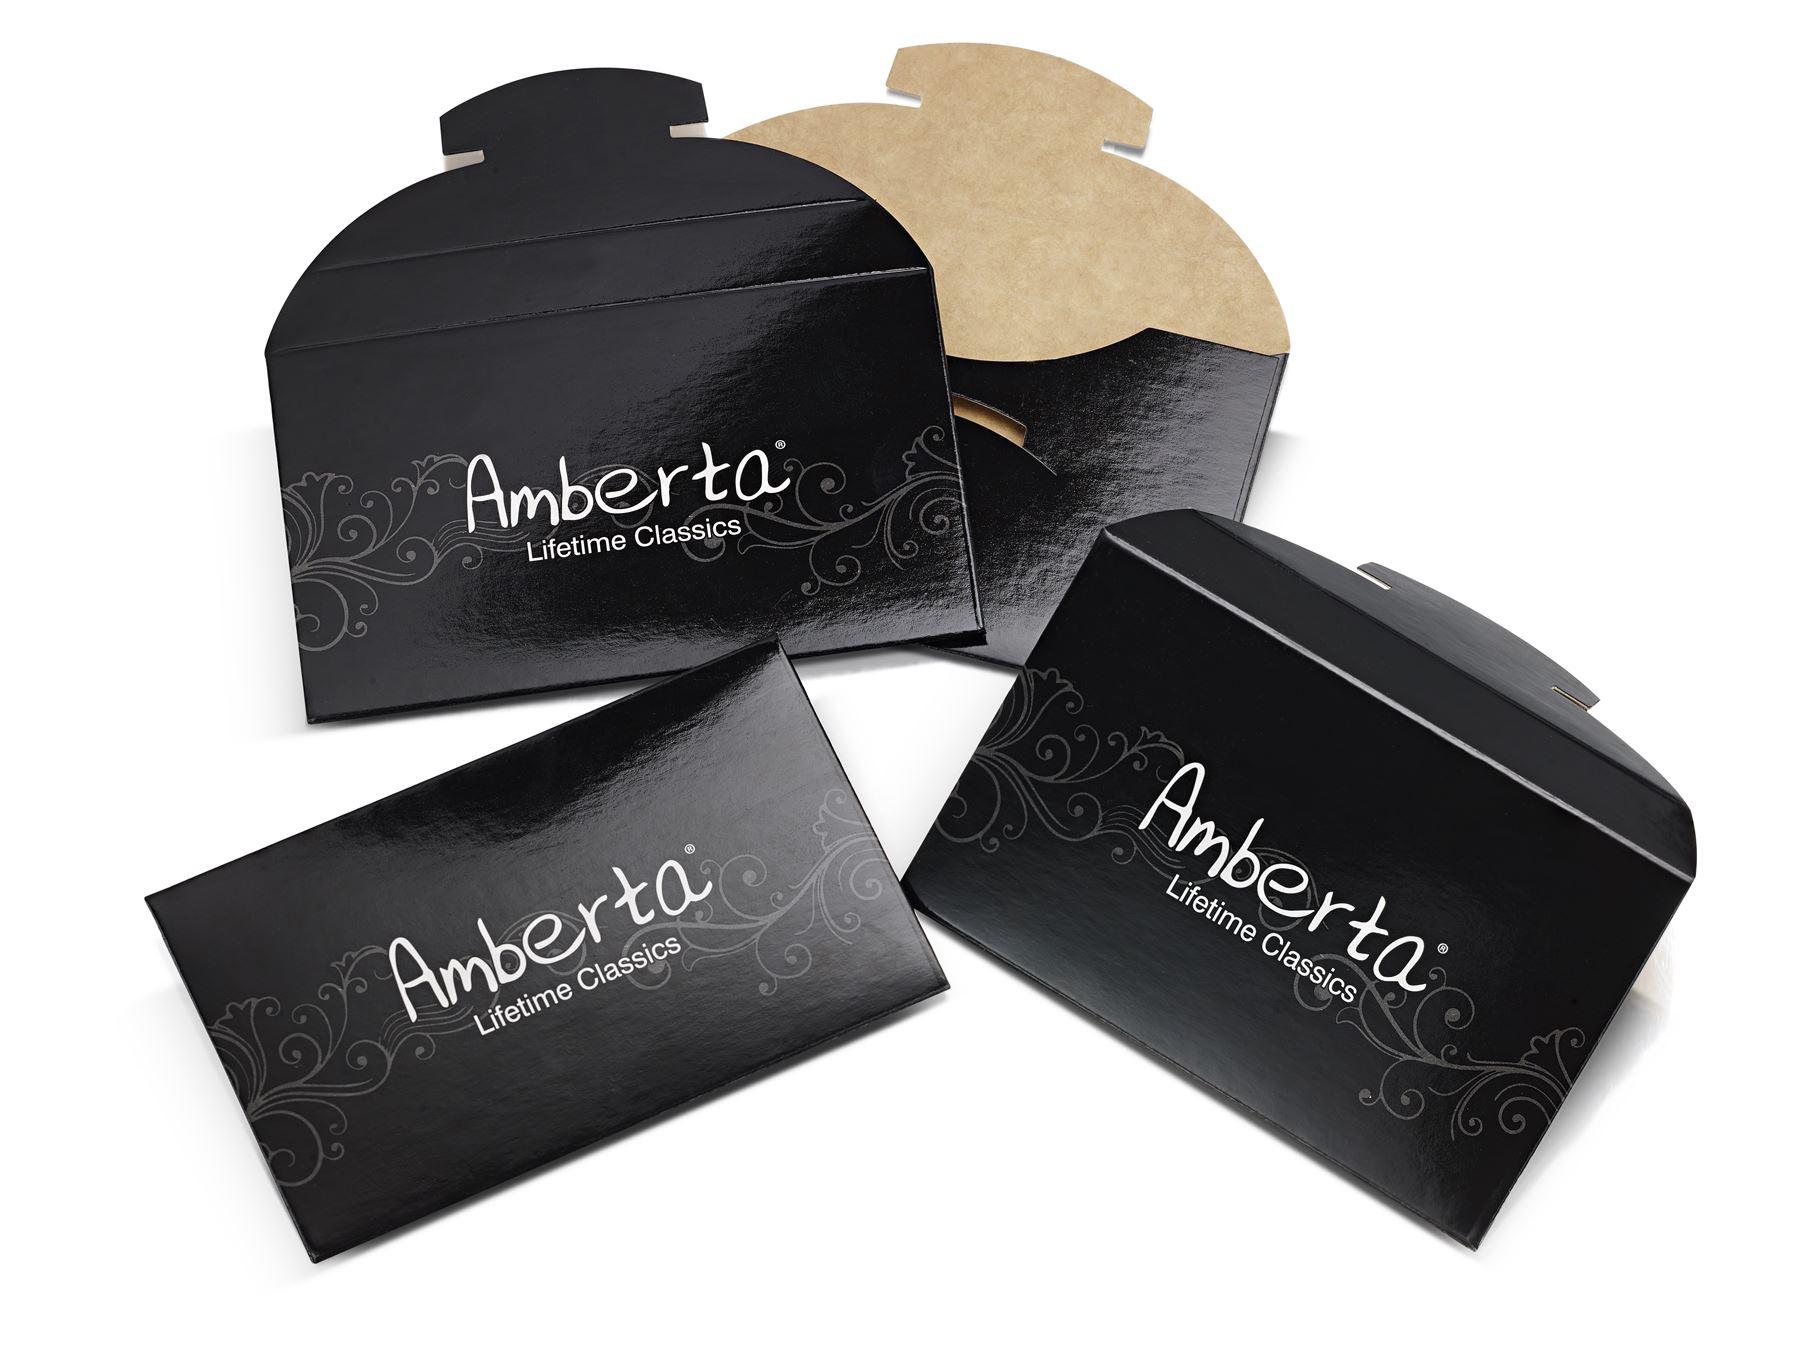 Amberta-Jewelry-925-Sterling-Silver-Adjustable-Bracelet-Italian-Bangle-for-Women thumbnail 58